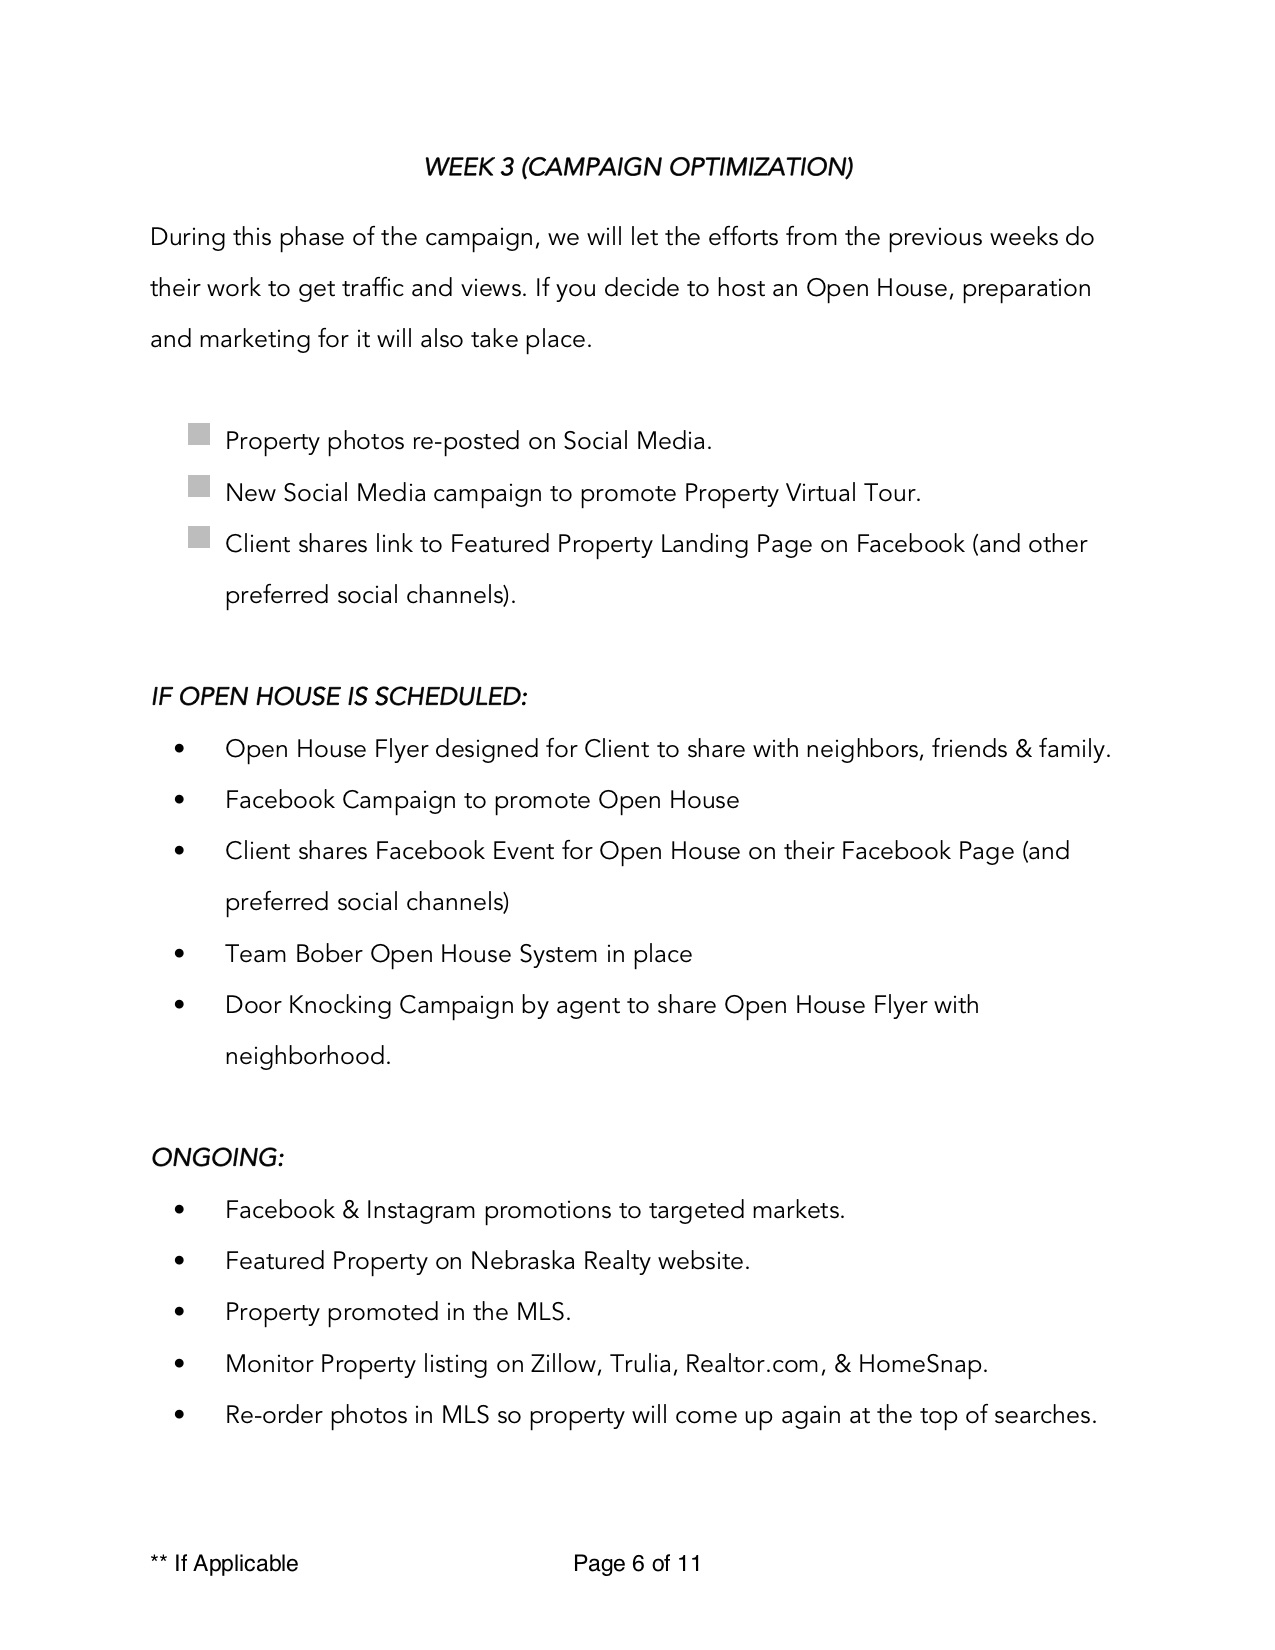 8 Week Marketing Plan6.jpg